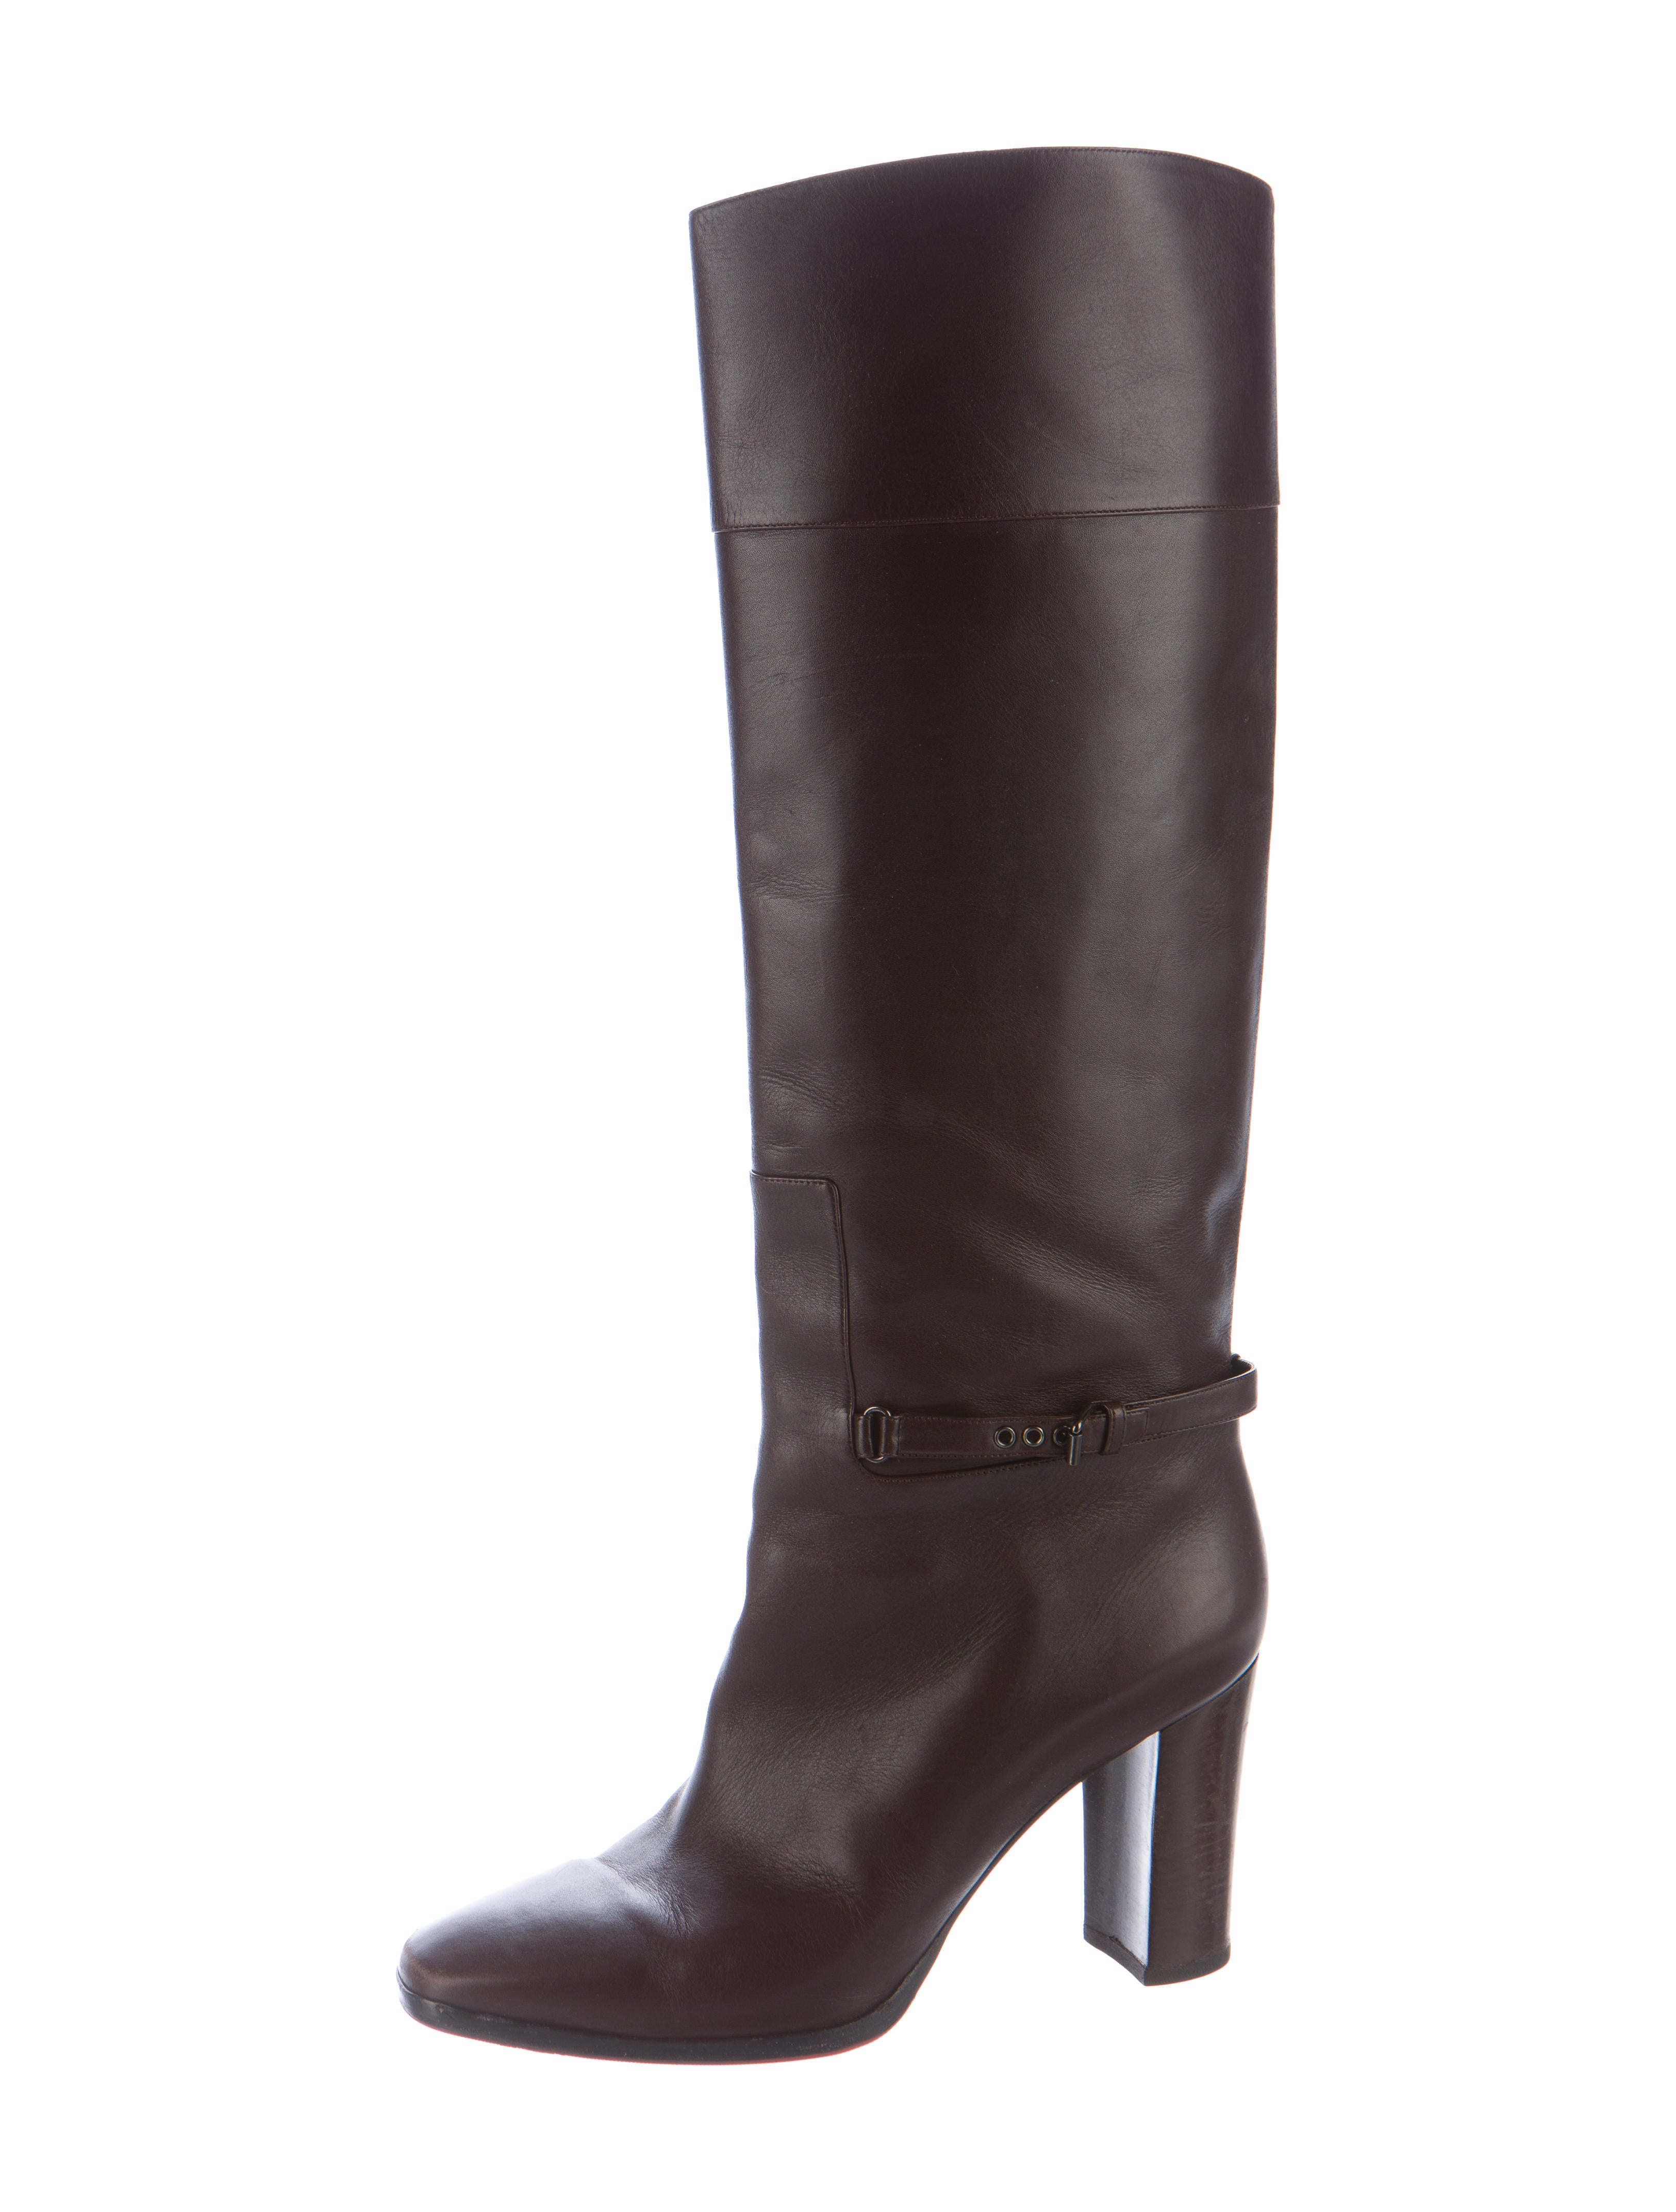 christian louboutin mervillon 85 leather boots shoes